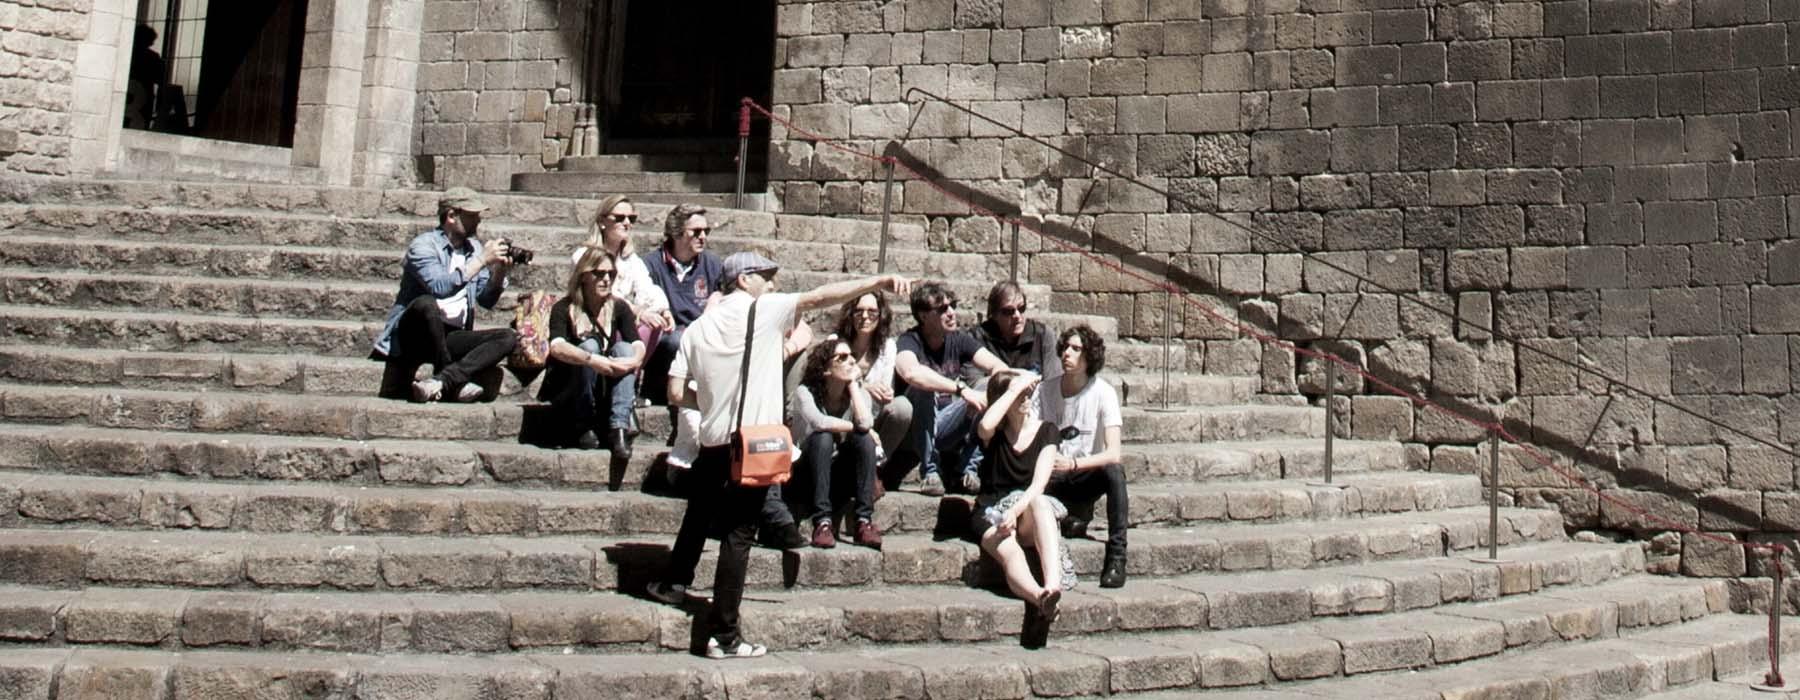 BARCELONA TOURS 10% OFF